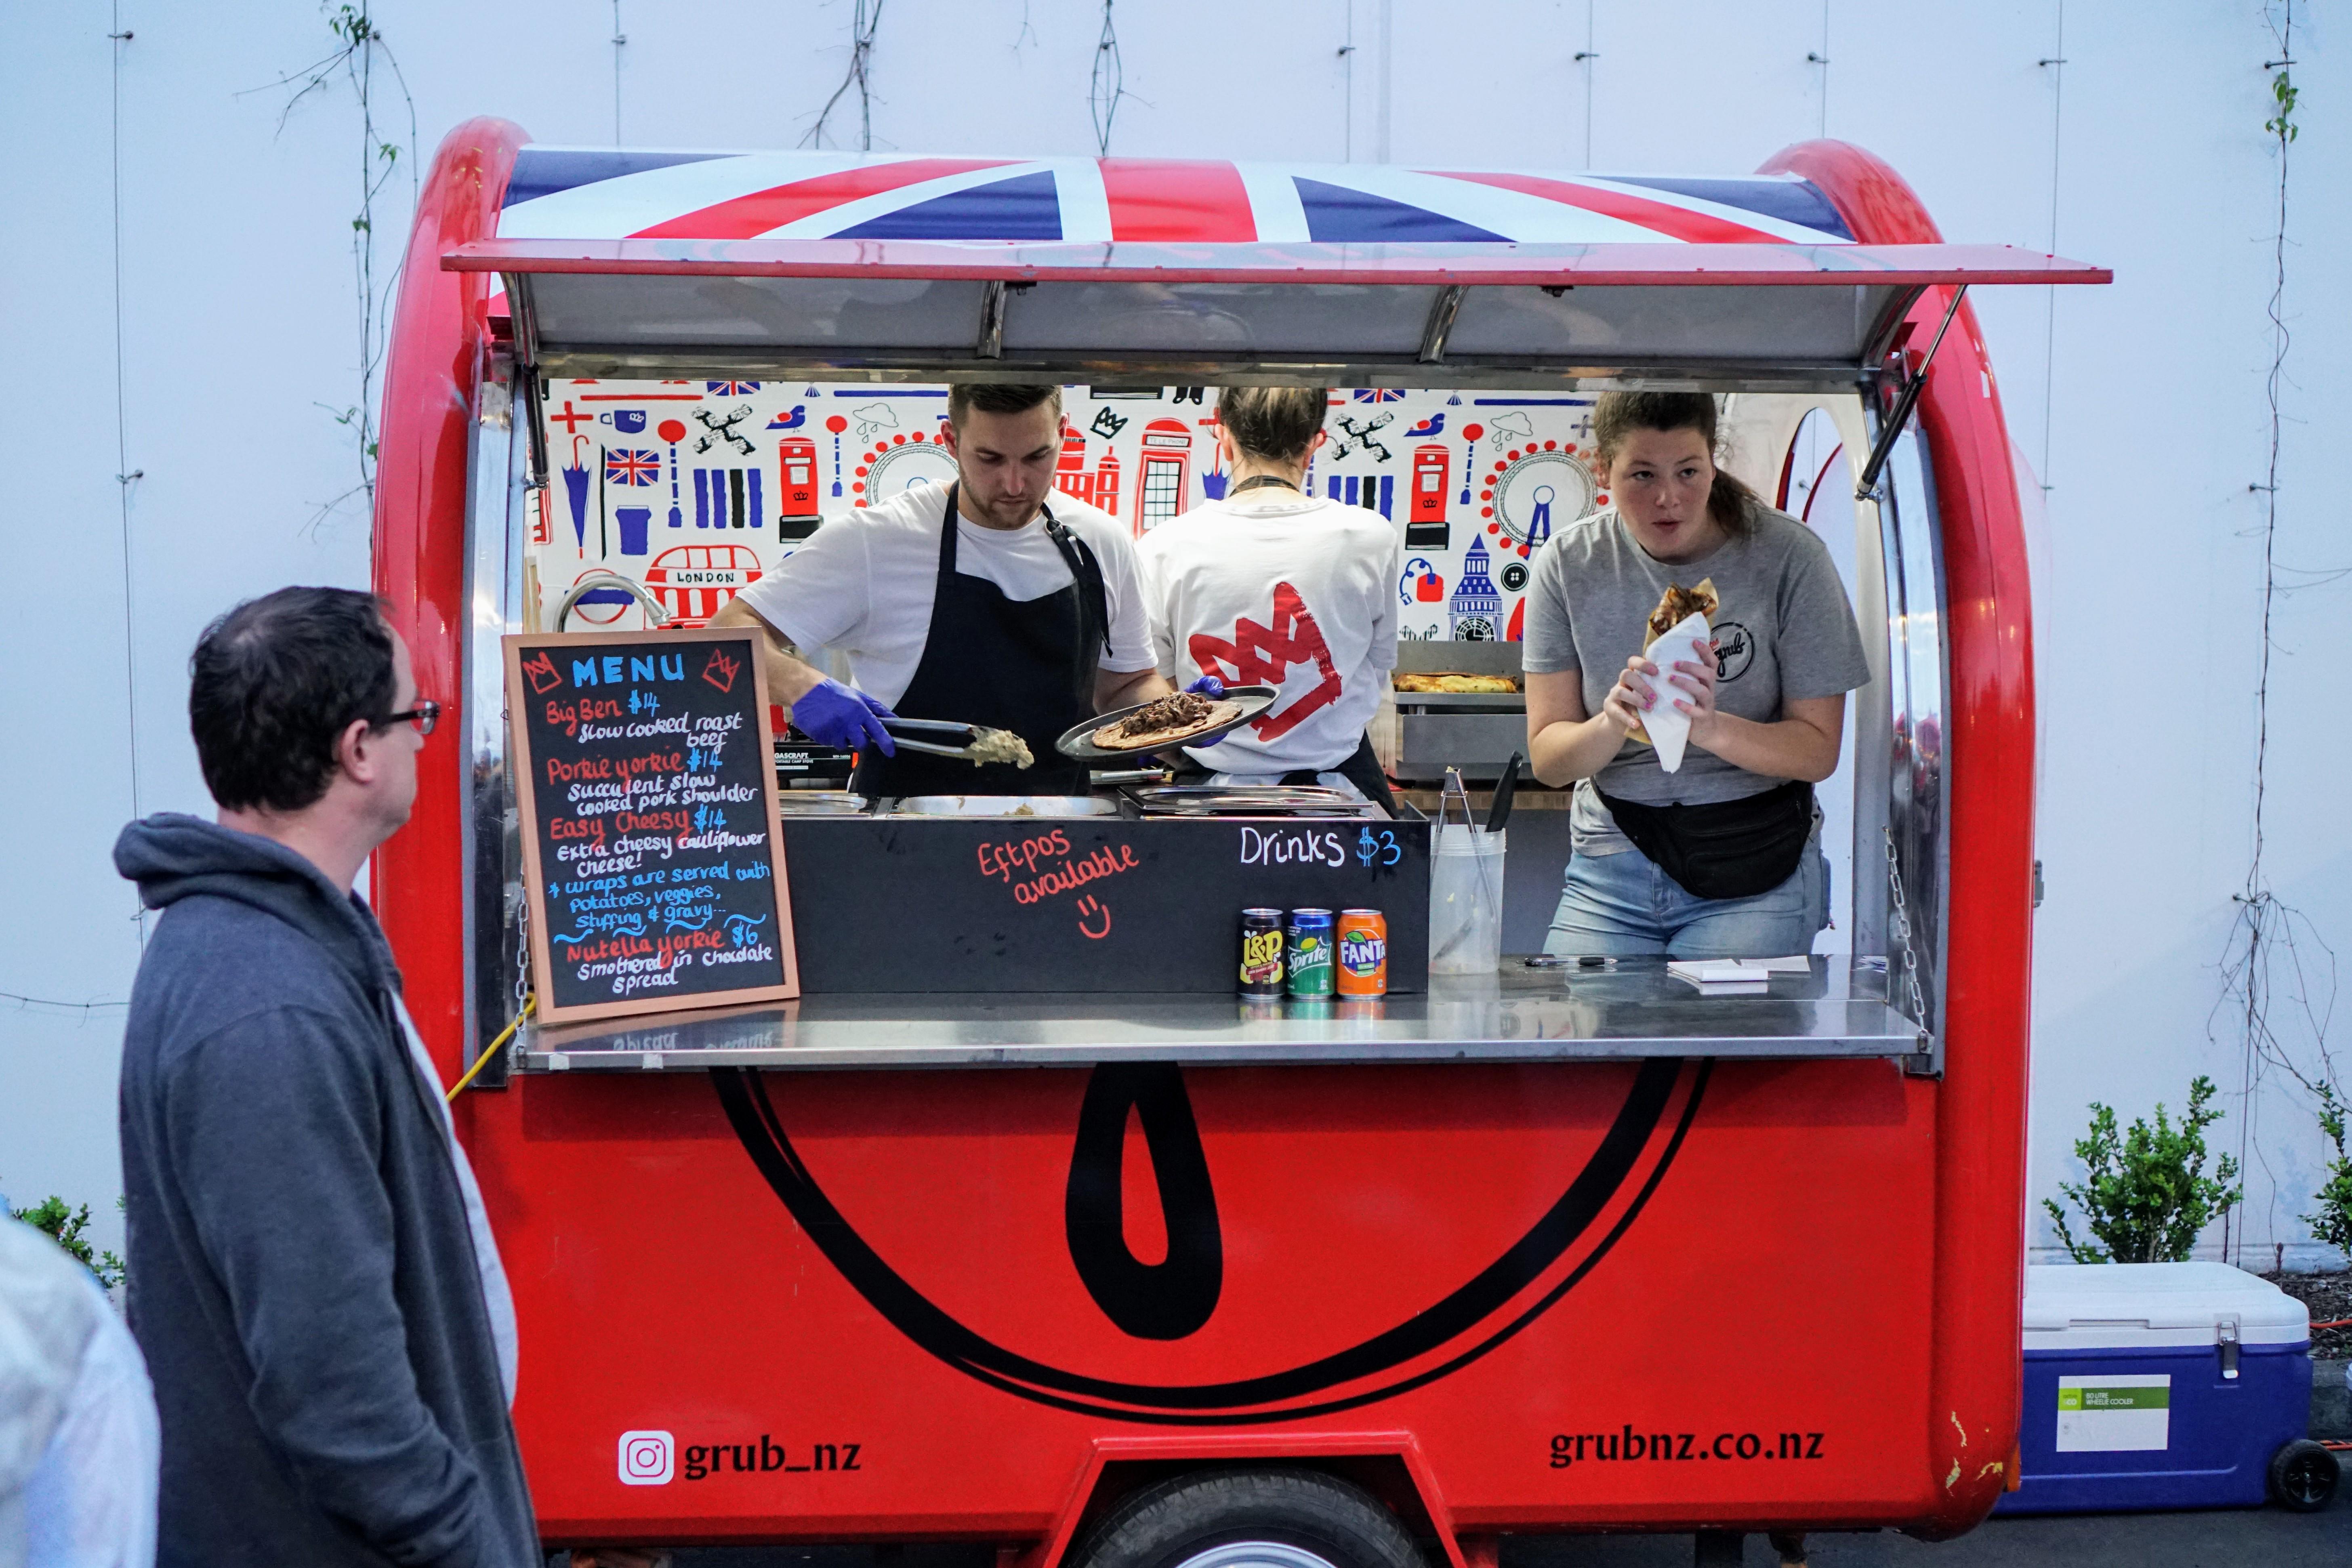 Auckland Food Truck